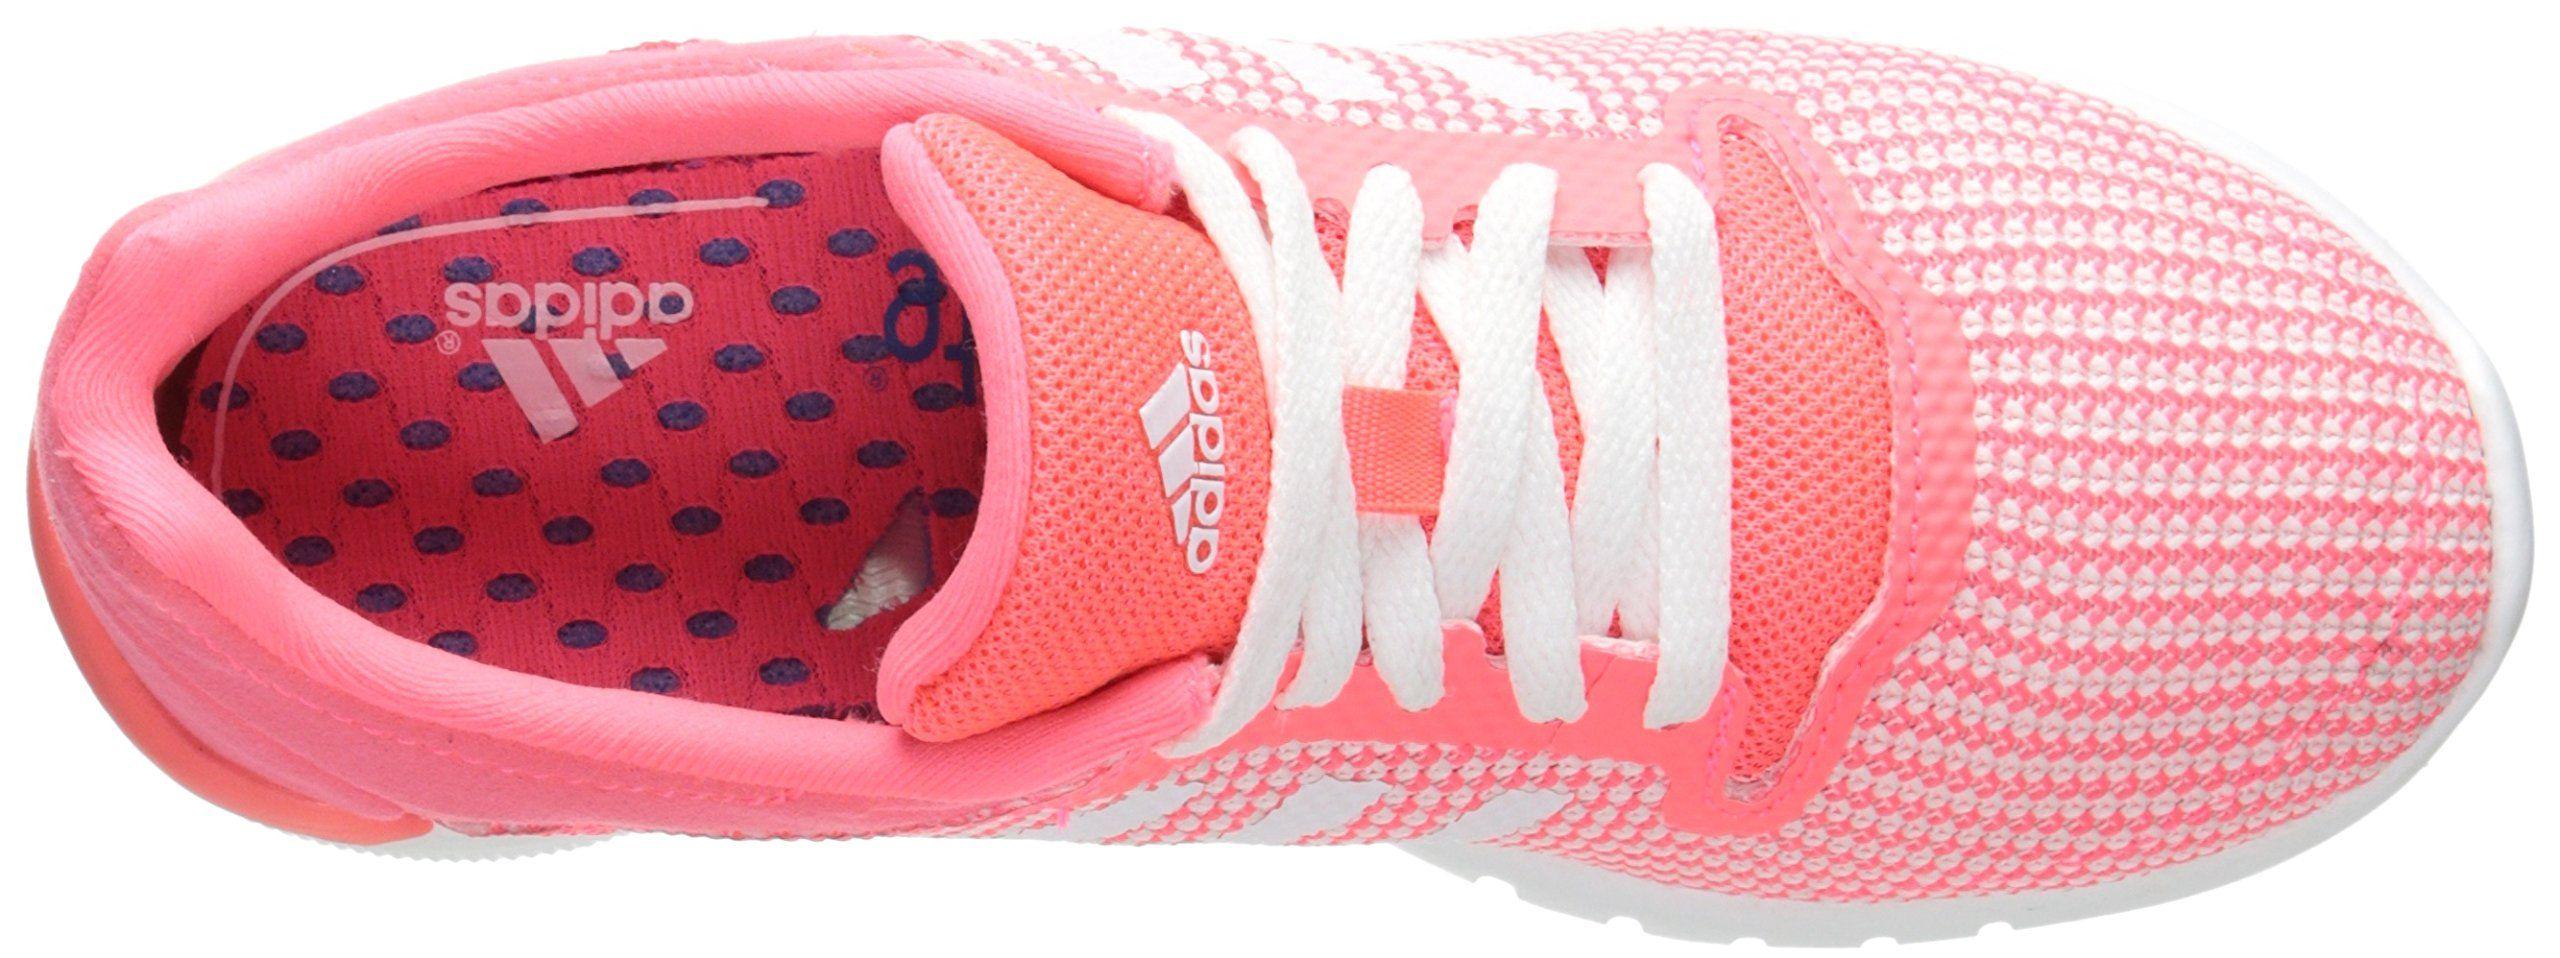 9fd4b2d62065 adidas Performance CC Cross Country Fresh 2 K Running Shoe Little Kid Big  Kid Flash